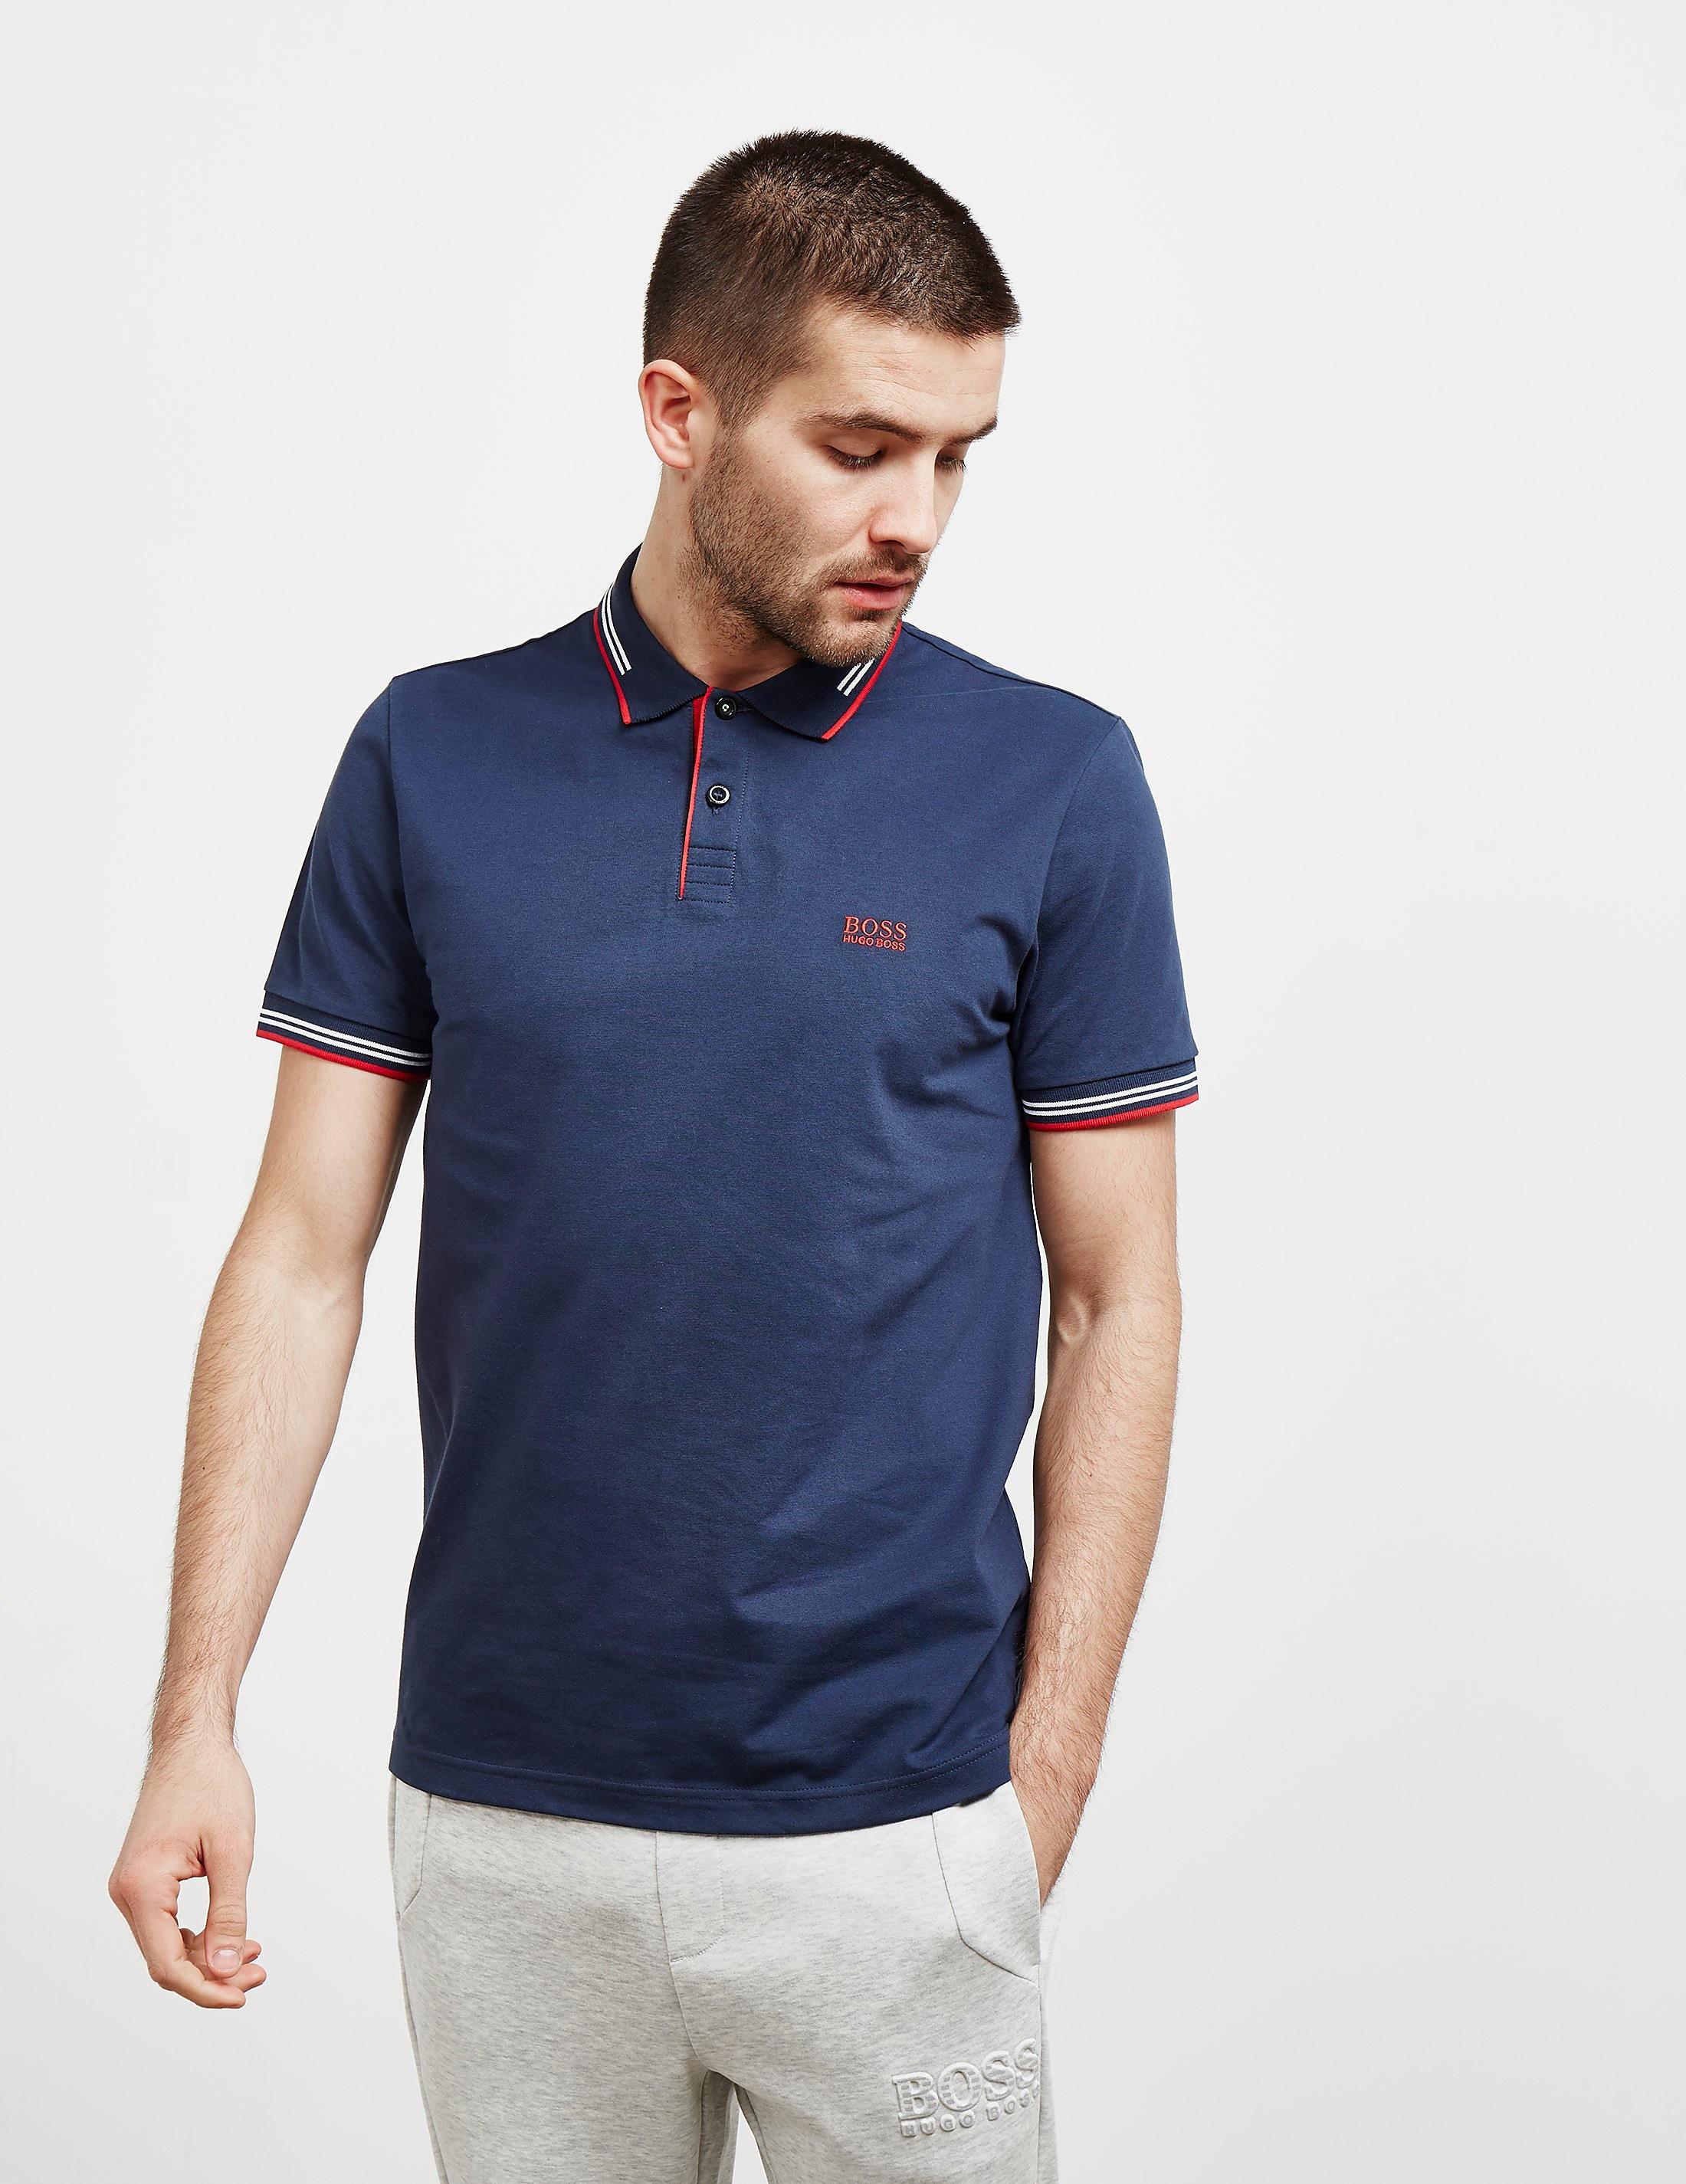 BOSS Paul Short Sleeve Polo Shirt